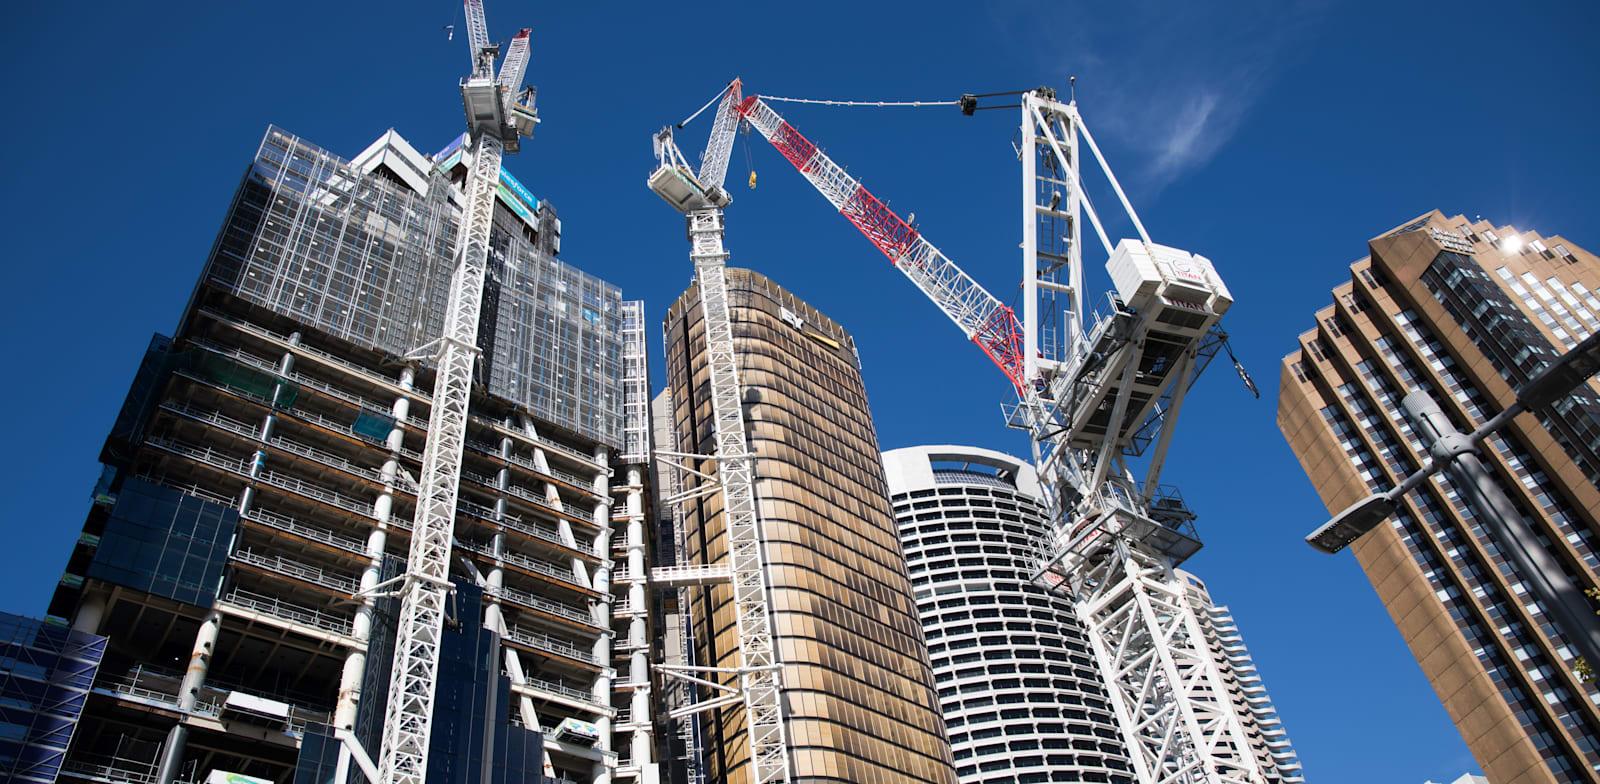 בנייה / צילום: Shutterstock